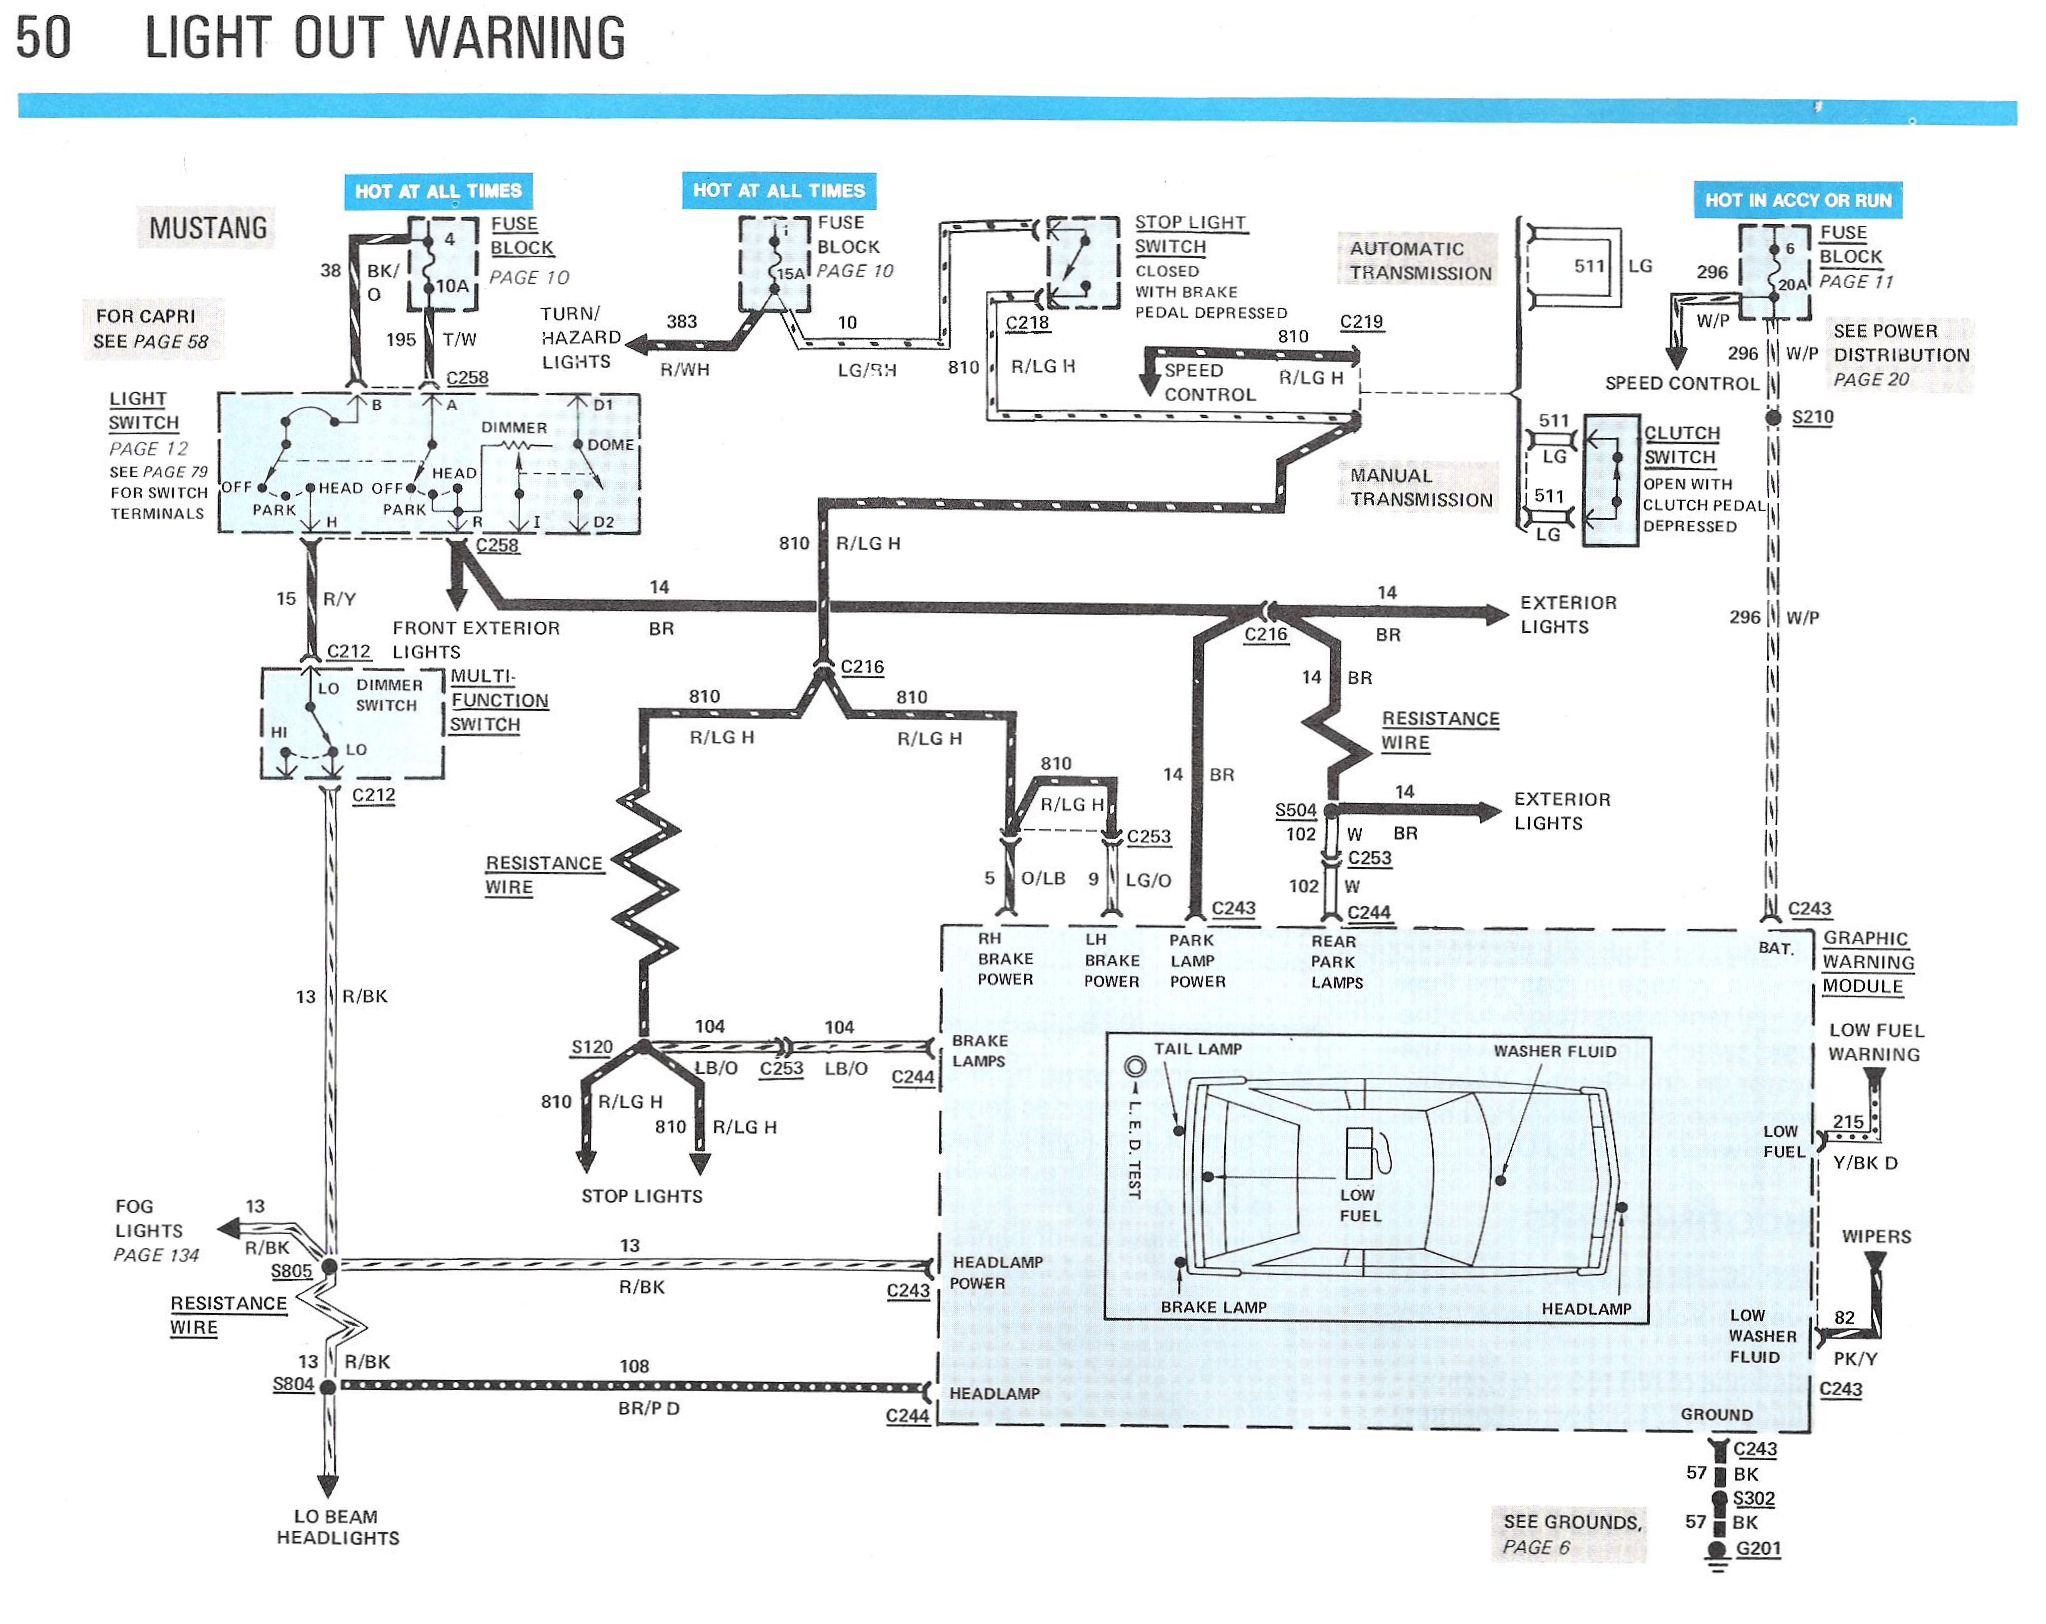 1986 bayliner capri wiring diagram photoelectric switch 2002